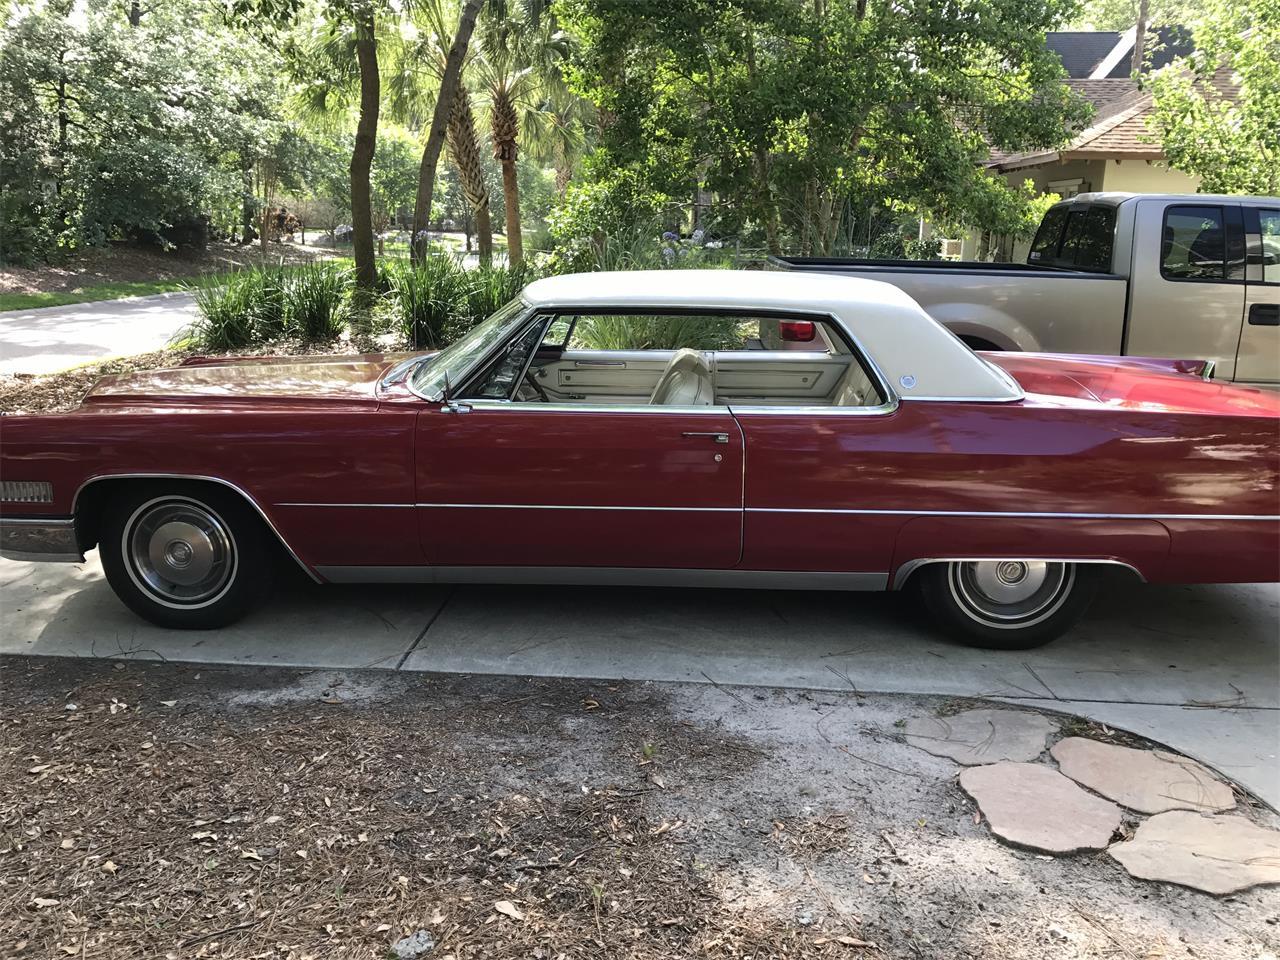 1966 Cadillac Coupe Deville For Sale Classiccars Com Cc 1003845